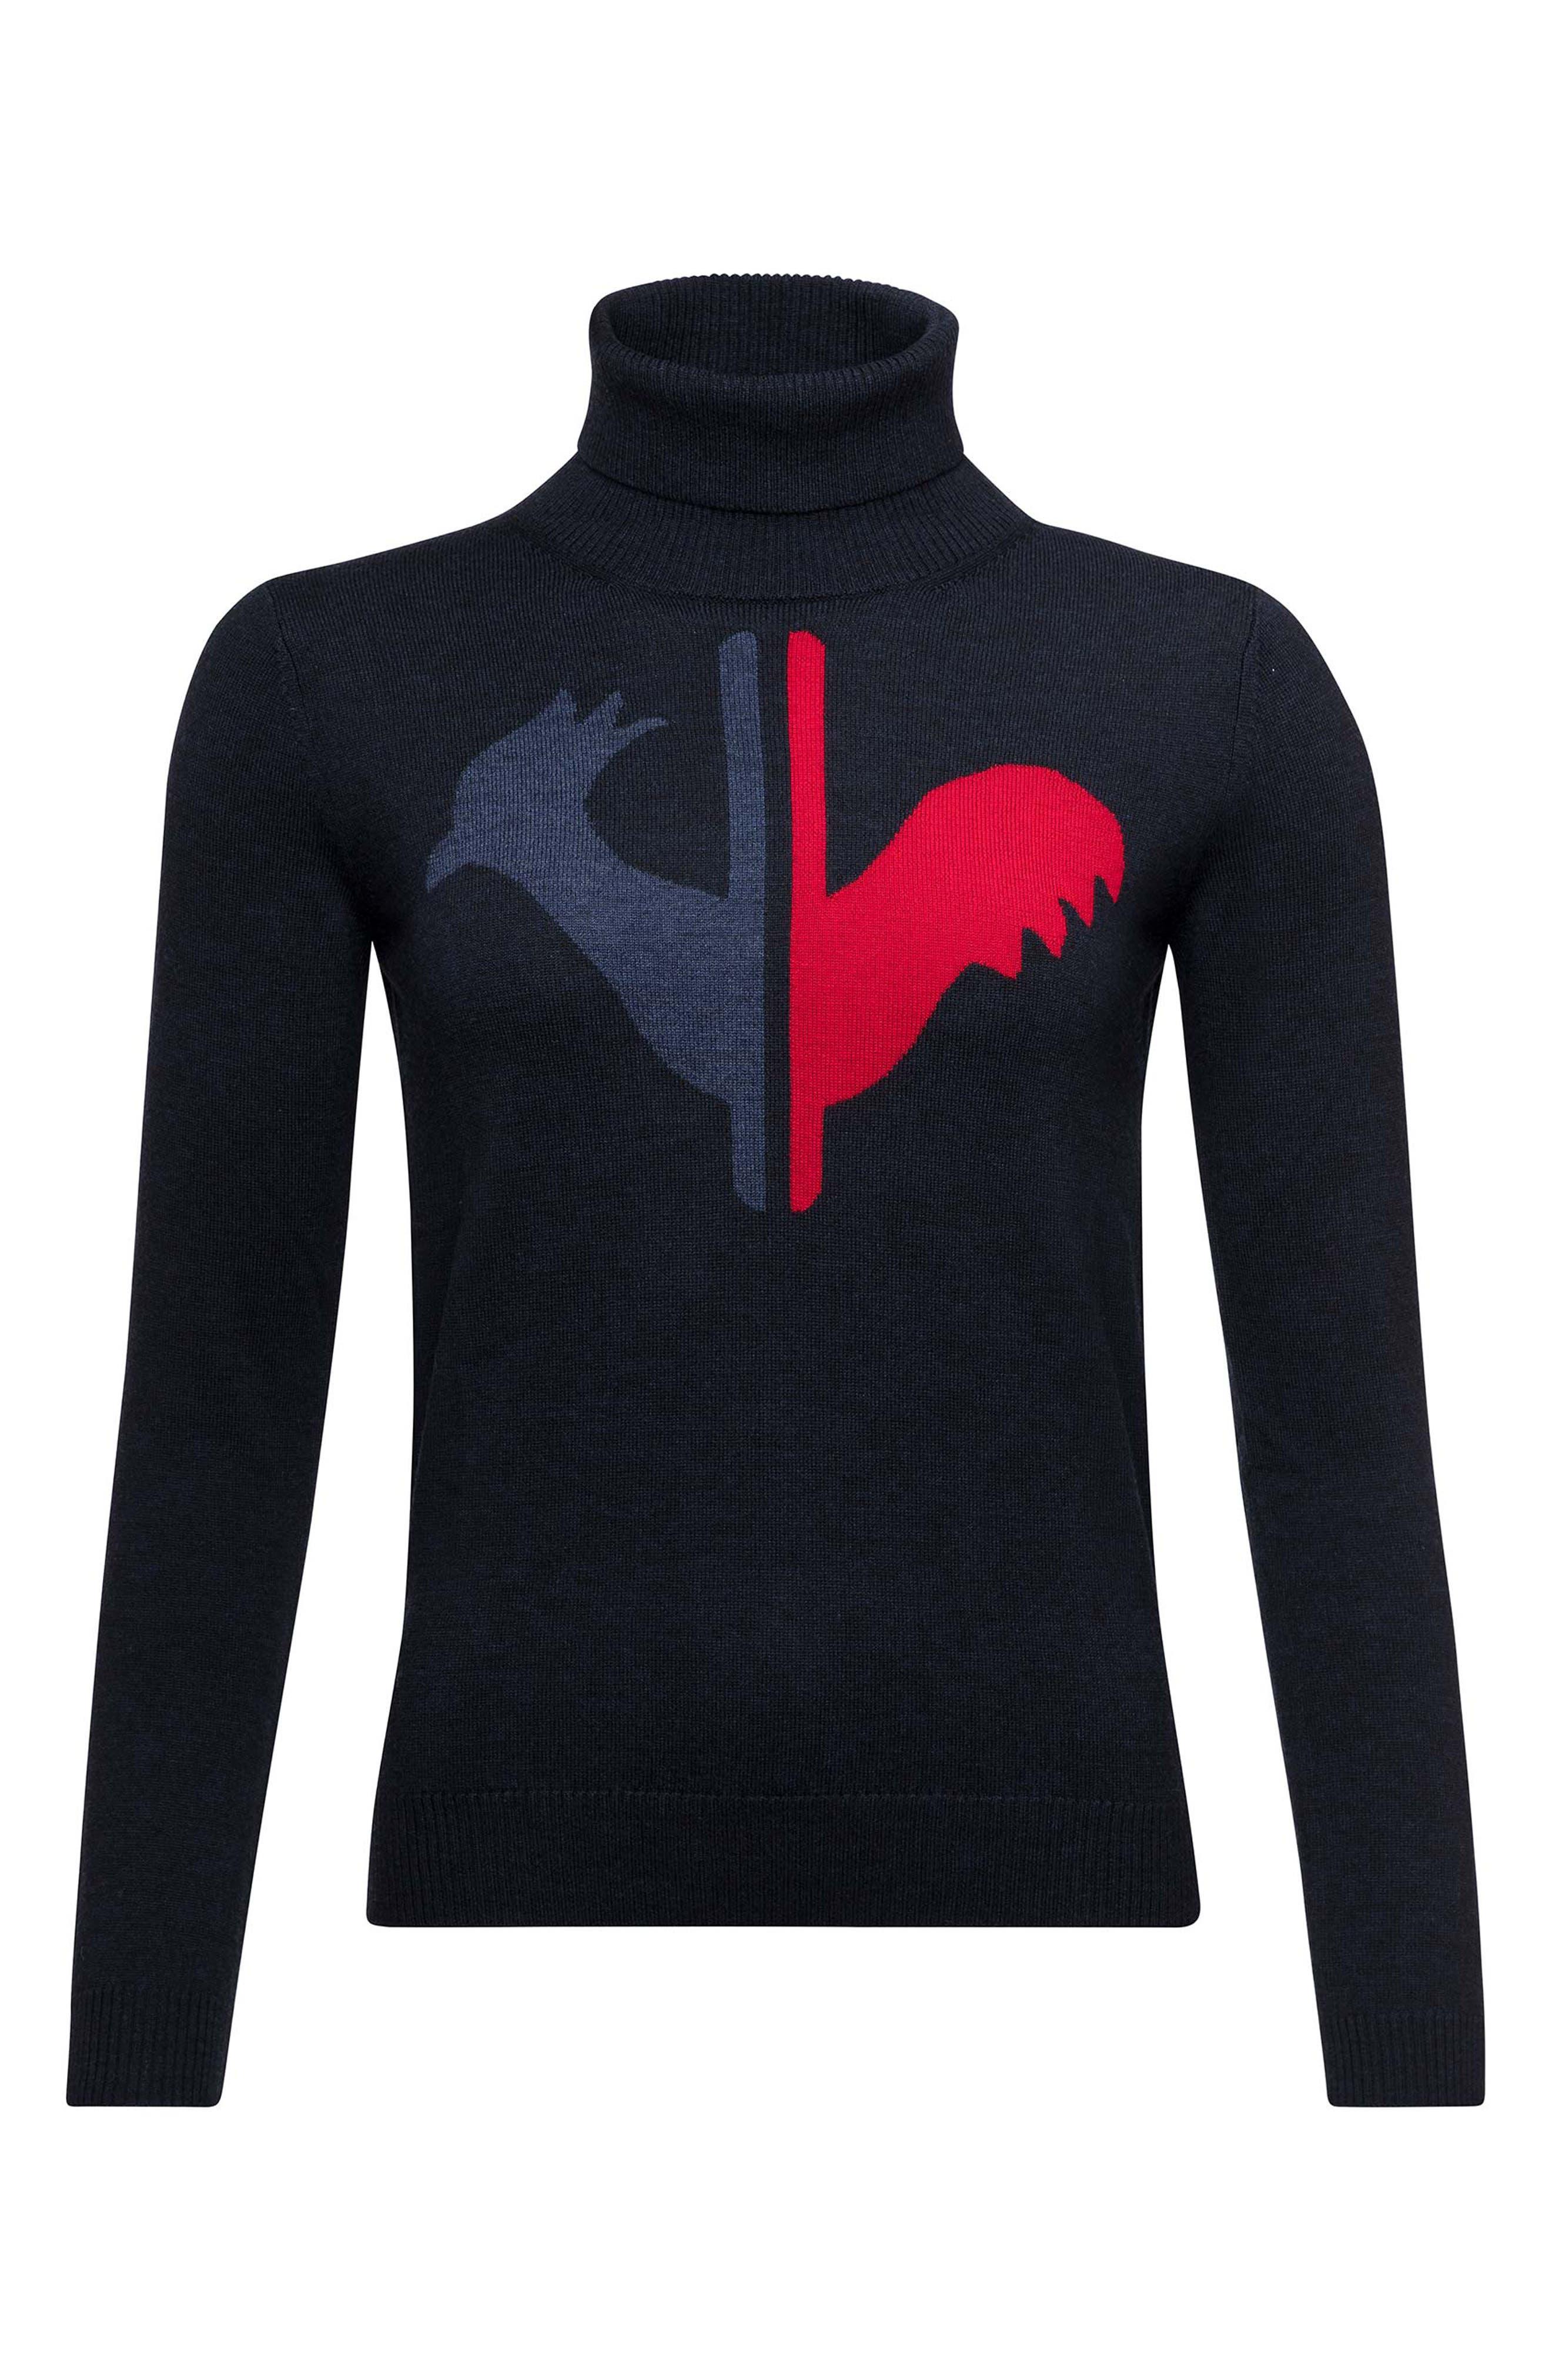 Rossignol Classique Tailored Fit Merino Wool Ski Sweater, Blue